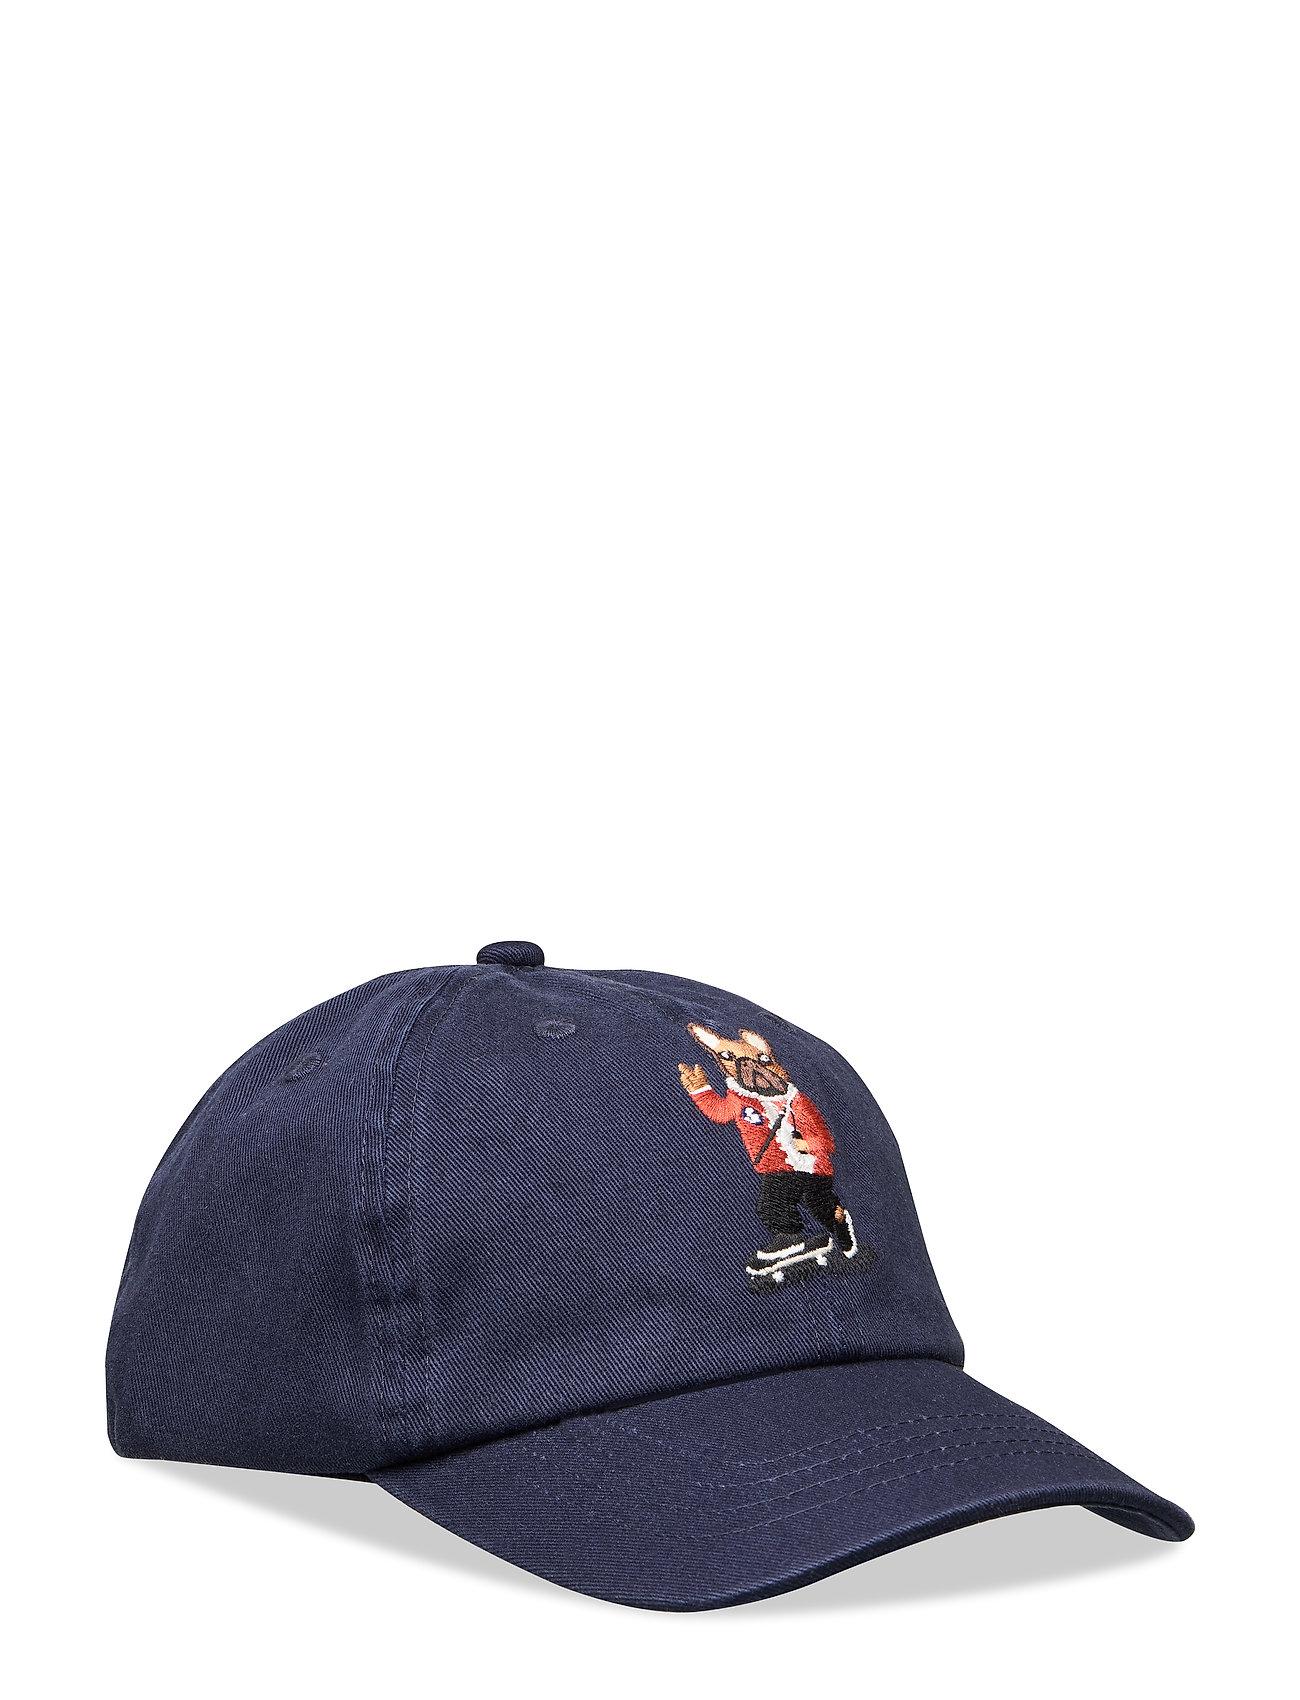 Image of Jacfrenchie Baseball Cap Jr Accessories Headwear Caps Blå Jack & J S (3329983197)